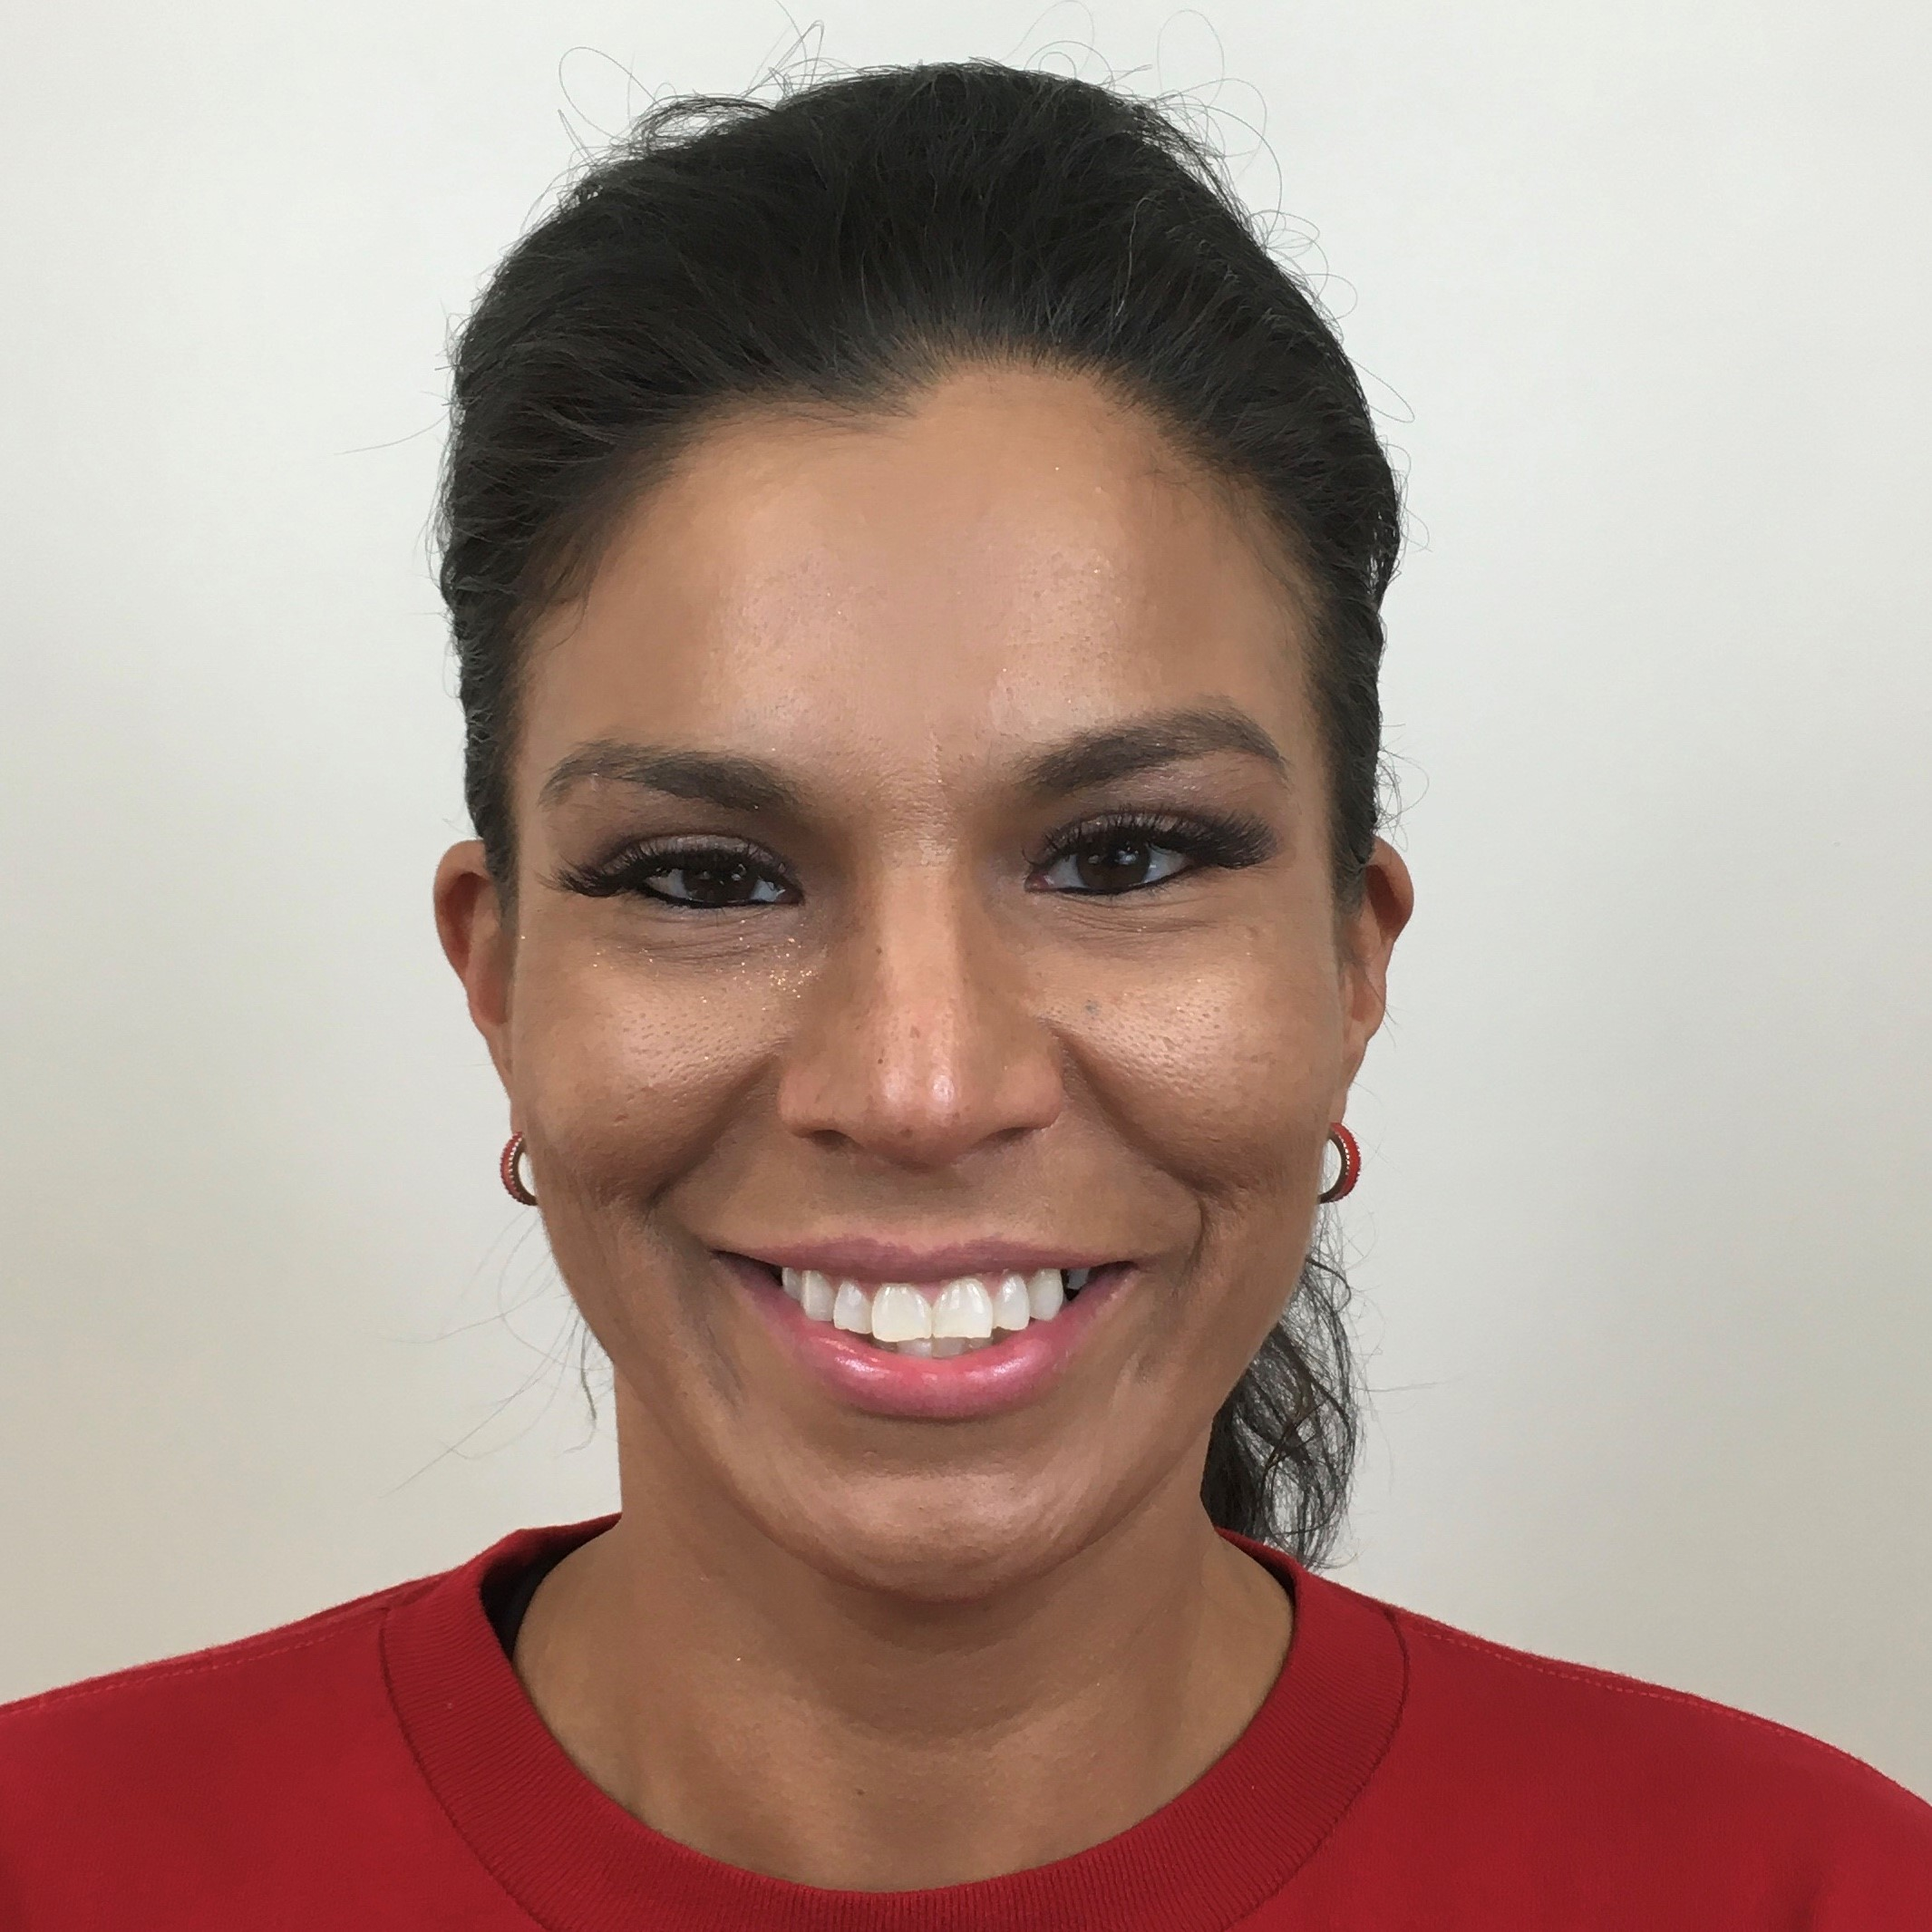 Megan Merrick 1